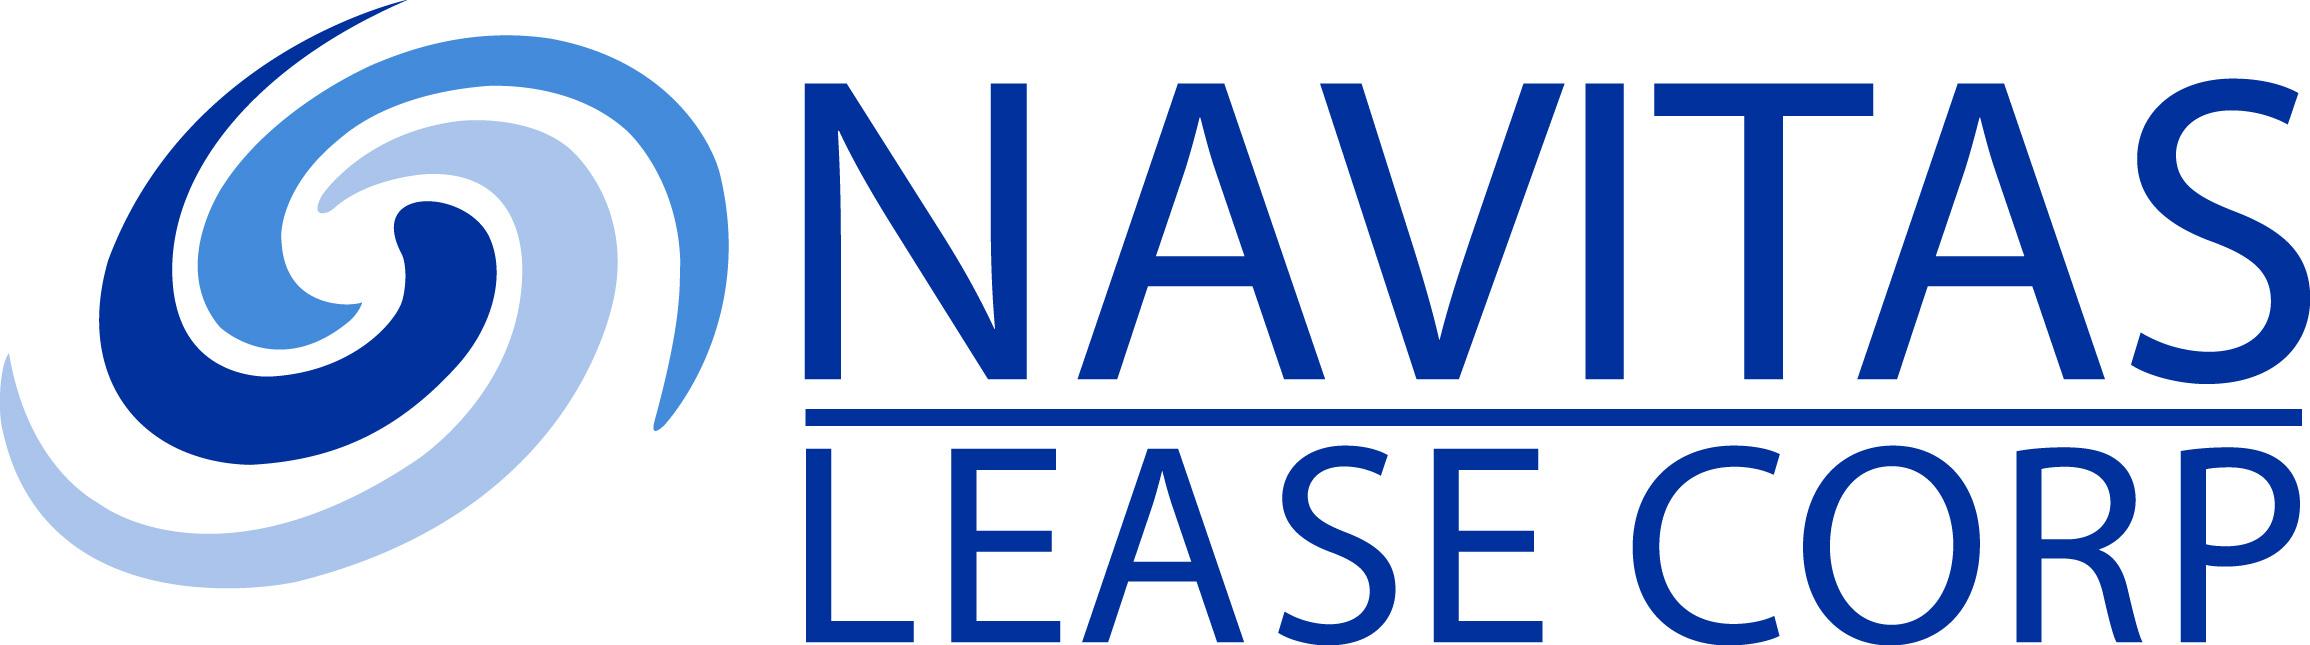 NAVITAS Lease Corp